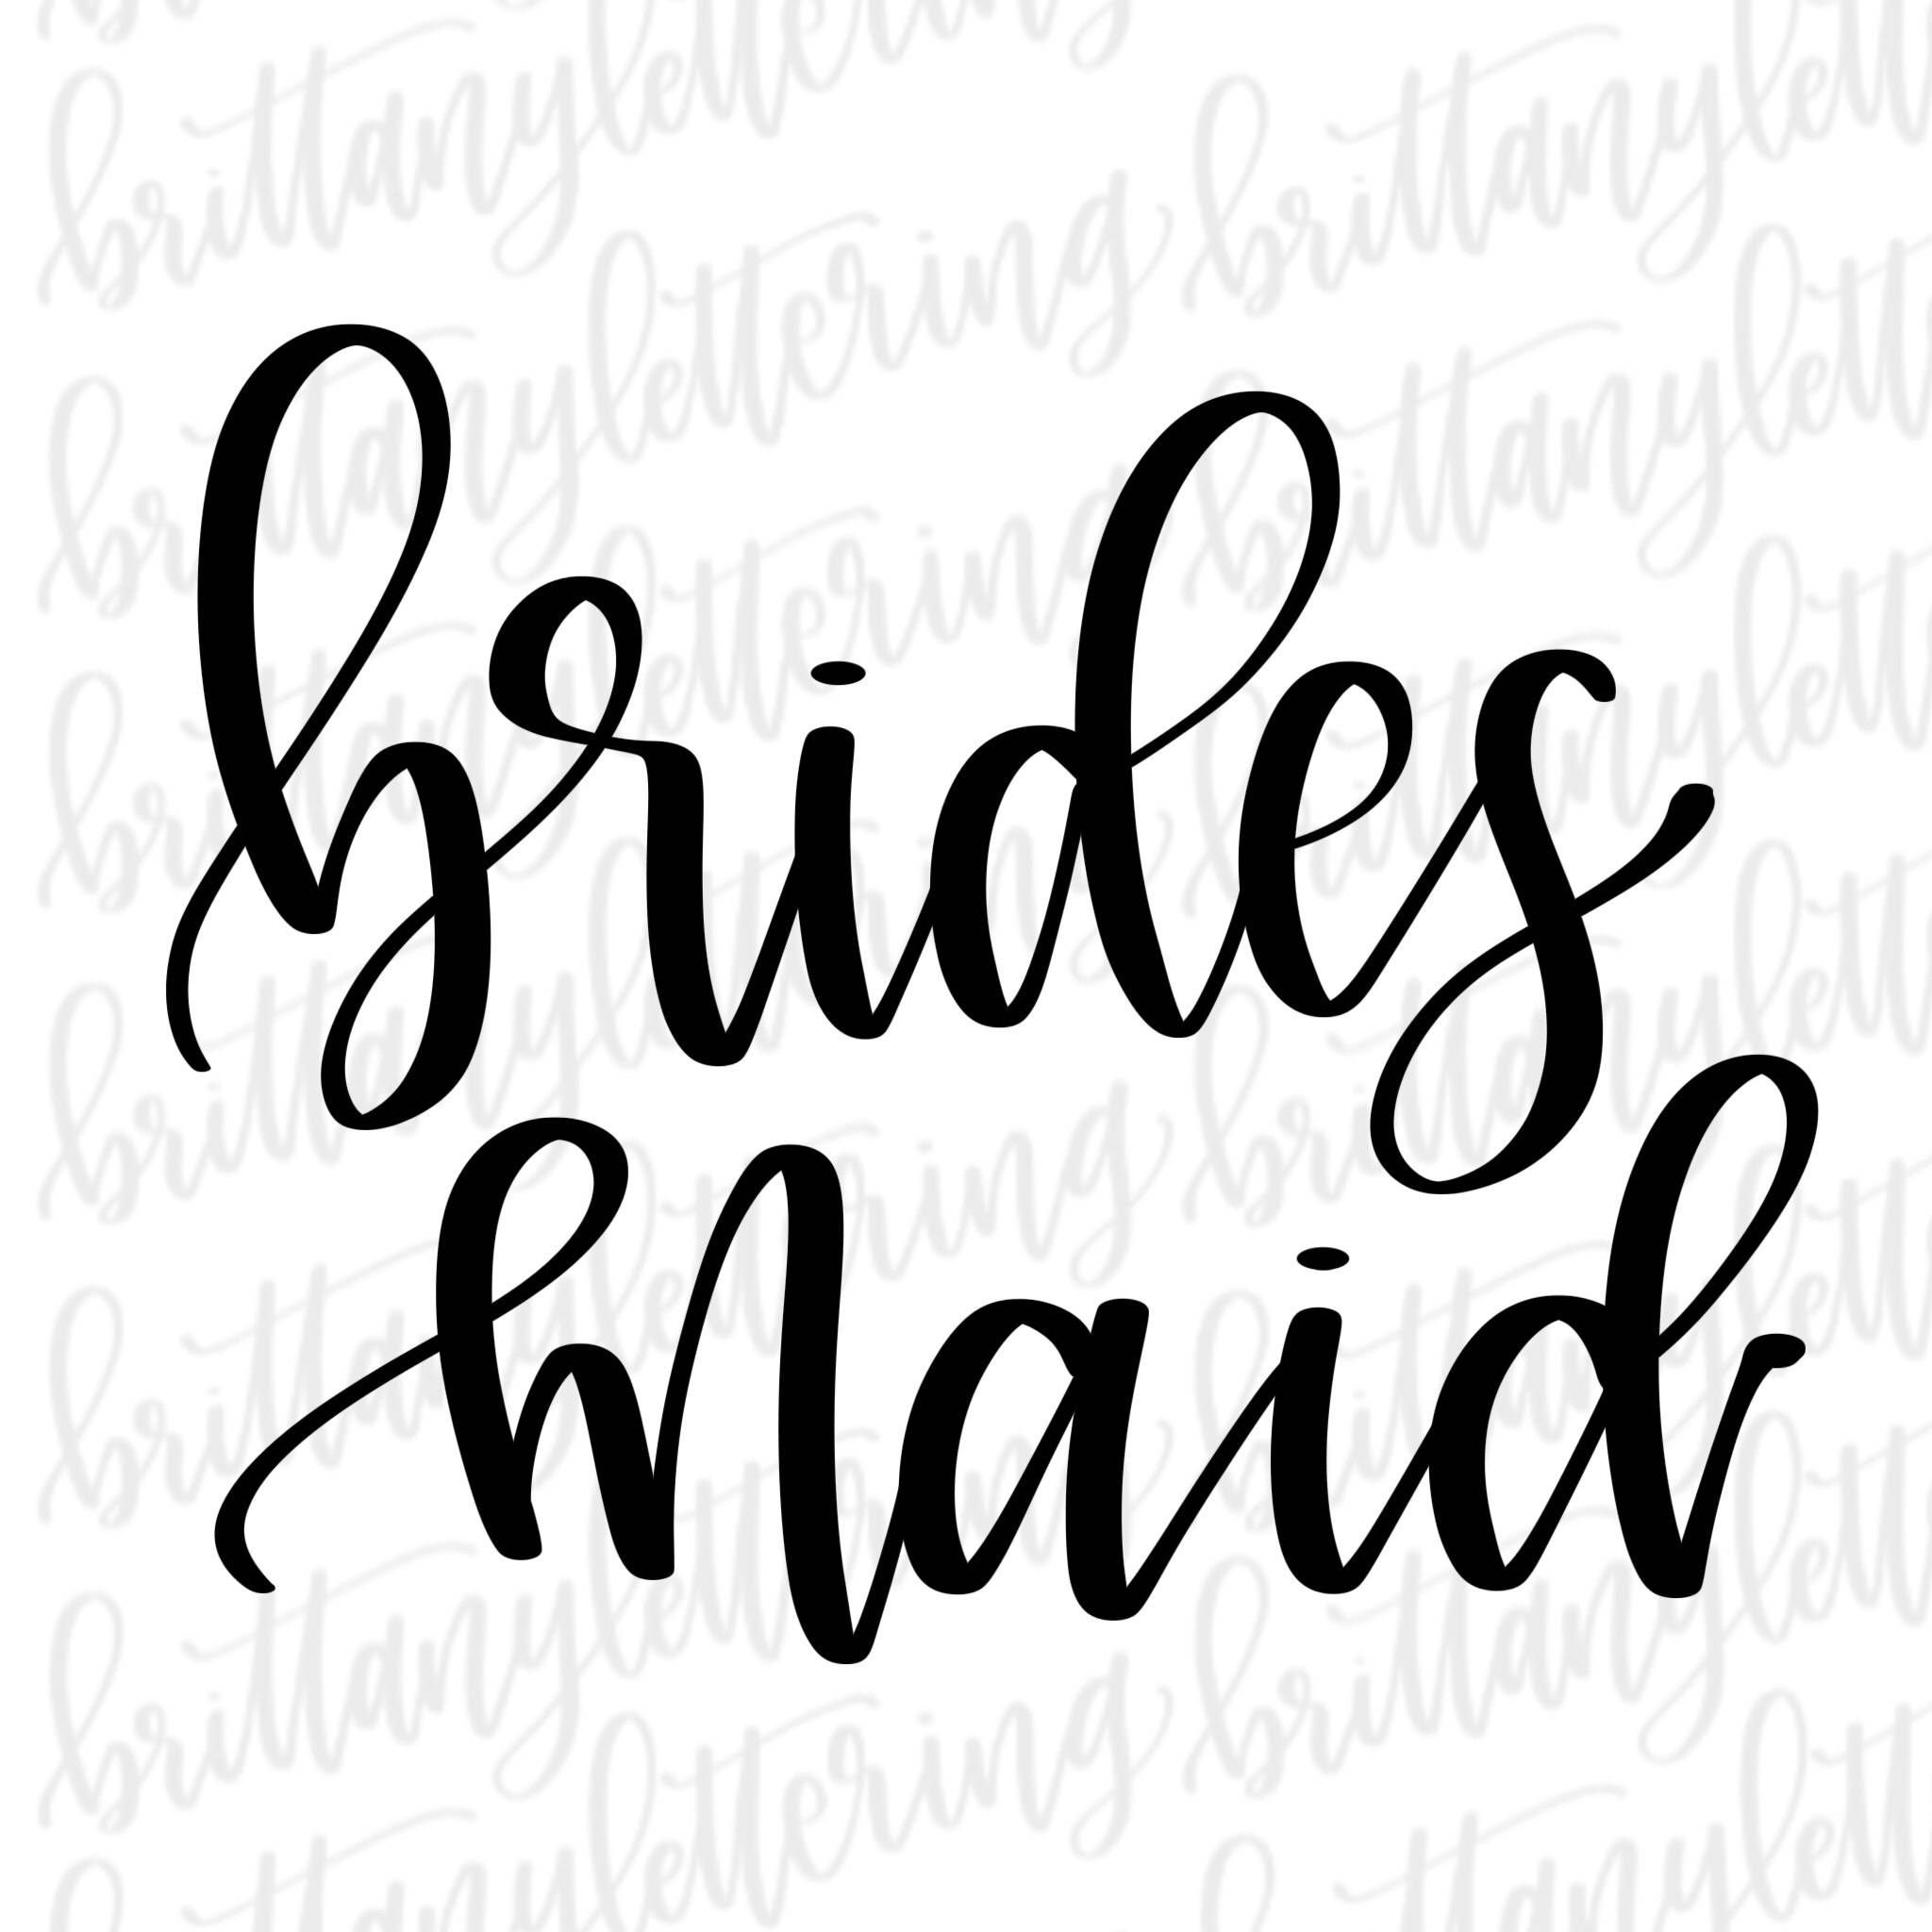 2048x2048 Bridesmaid Svg, Bridesmaid, Wedding Svg, Cricut Svg, Silhouette